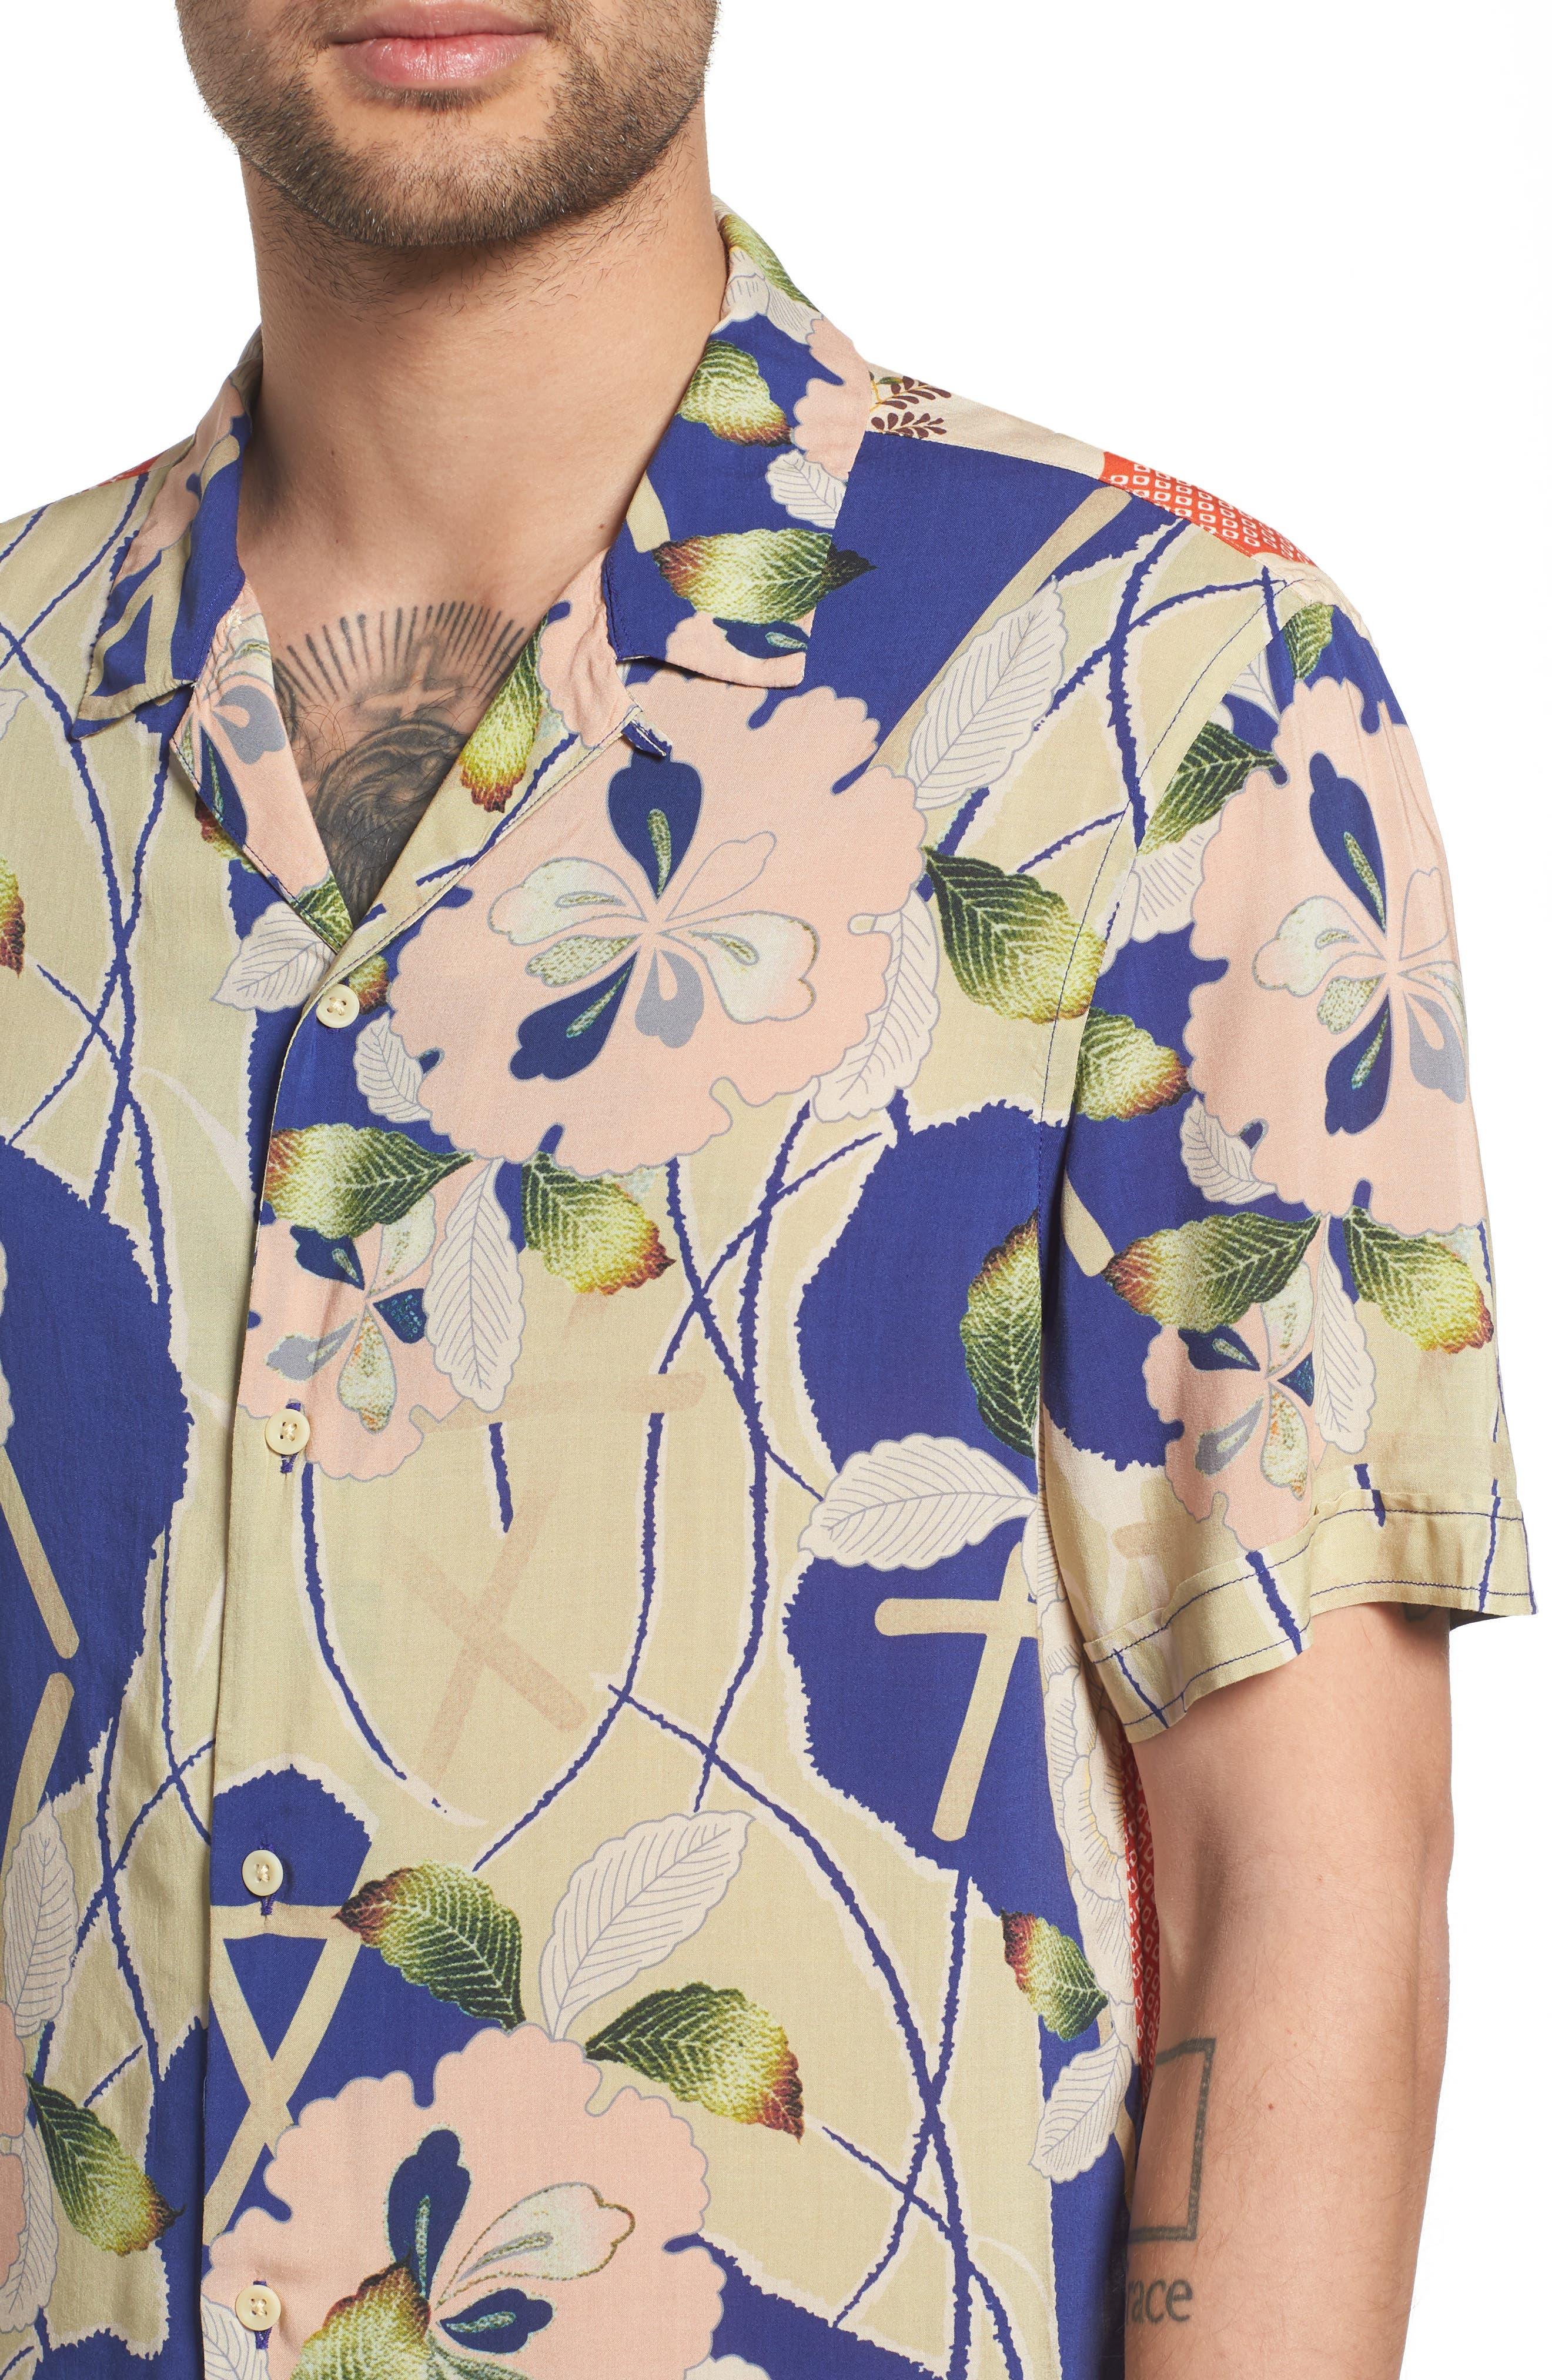 Fuyugi Regular Fit Short Sleeve Sport Shirt,                             Alternate thumbnail 2, color,                             Ink Navy